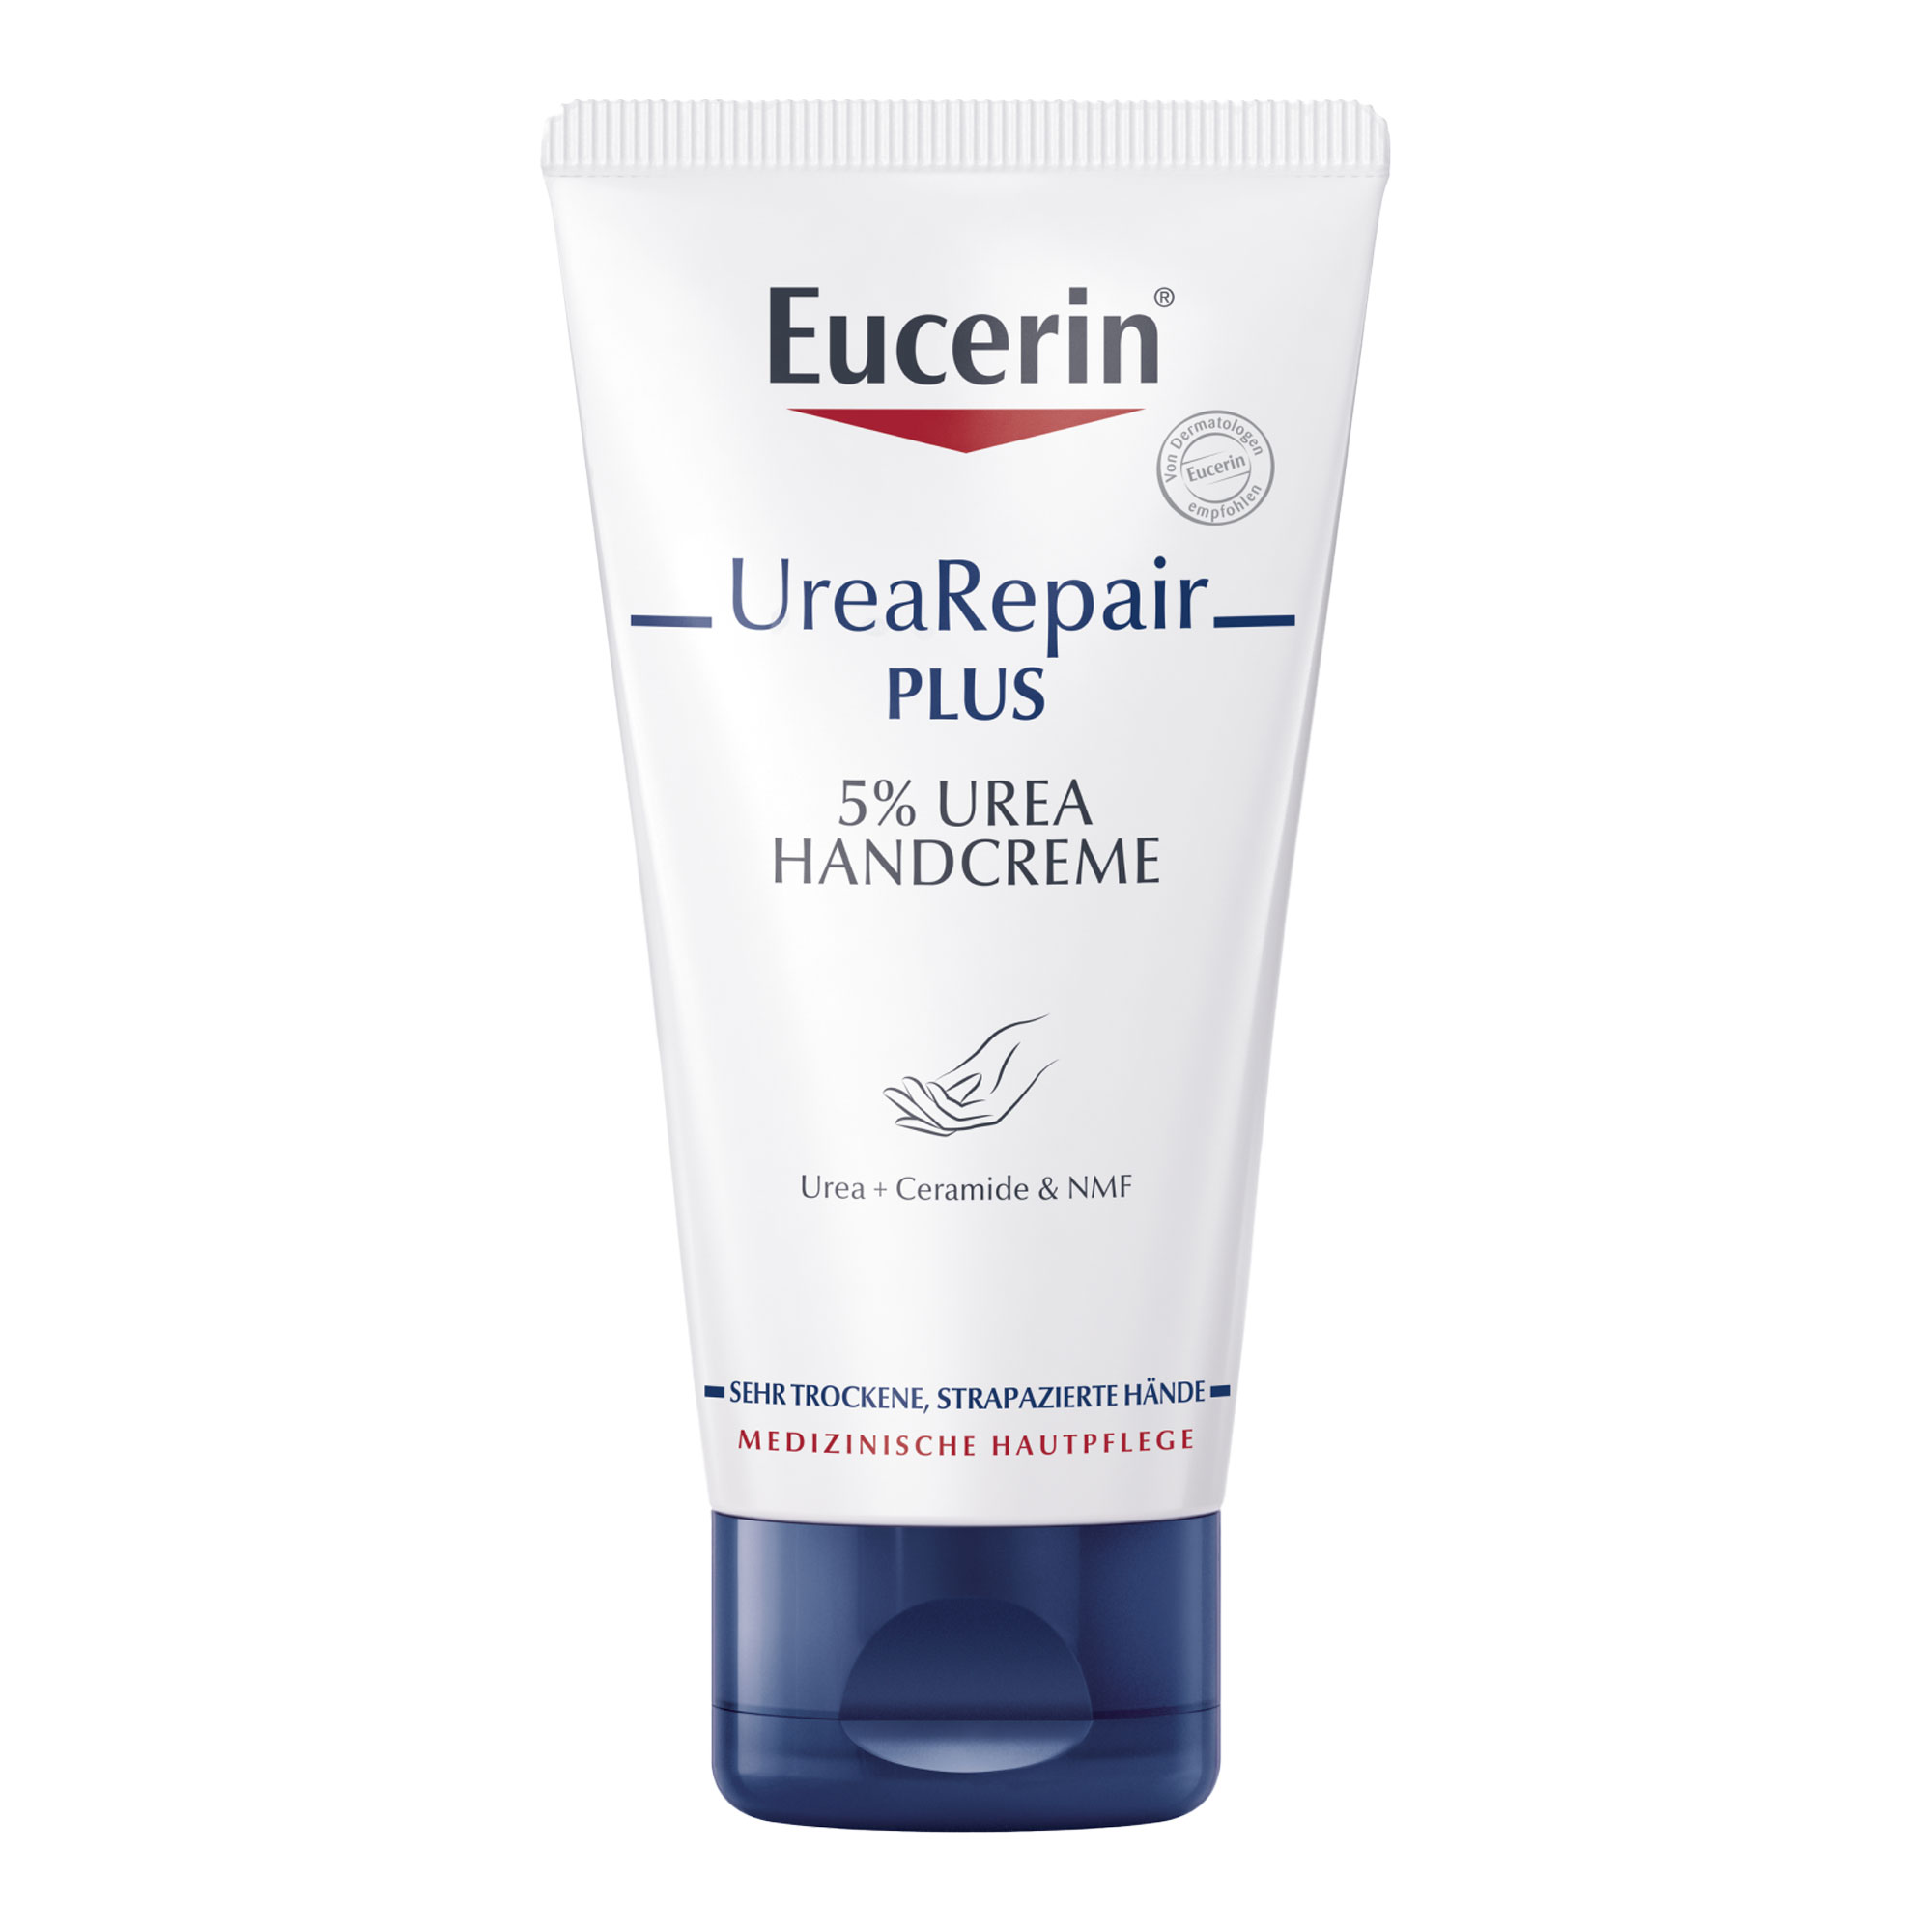 Eucerin UreaRepair Plus Handcreme 5 %